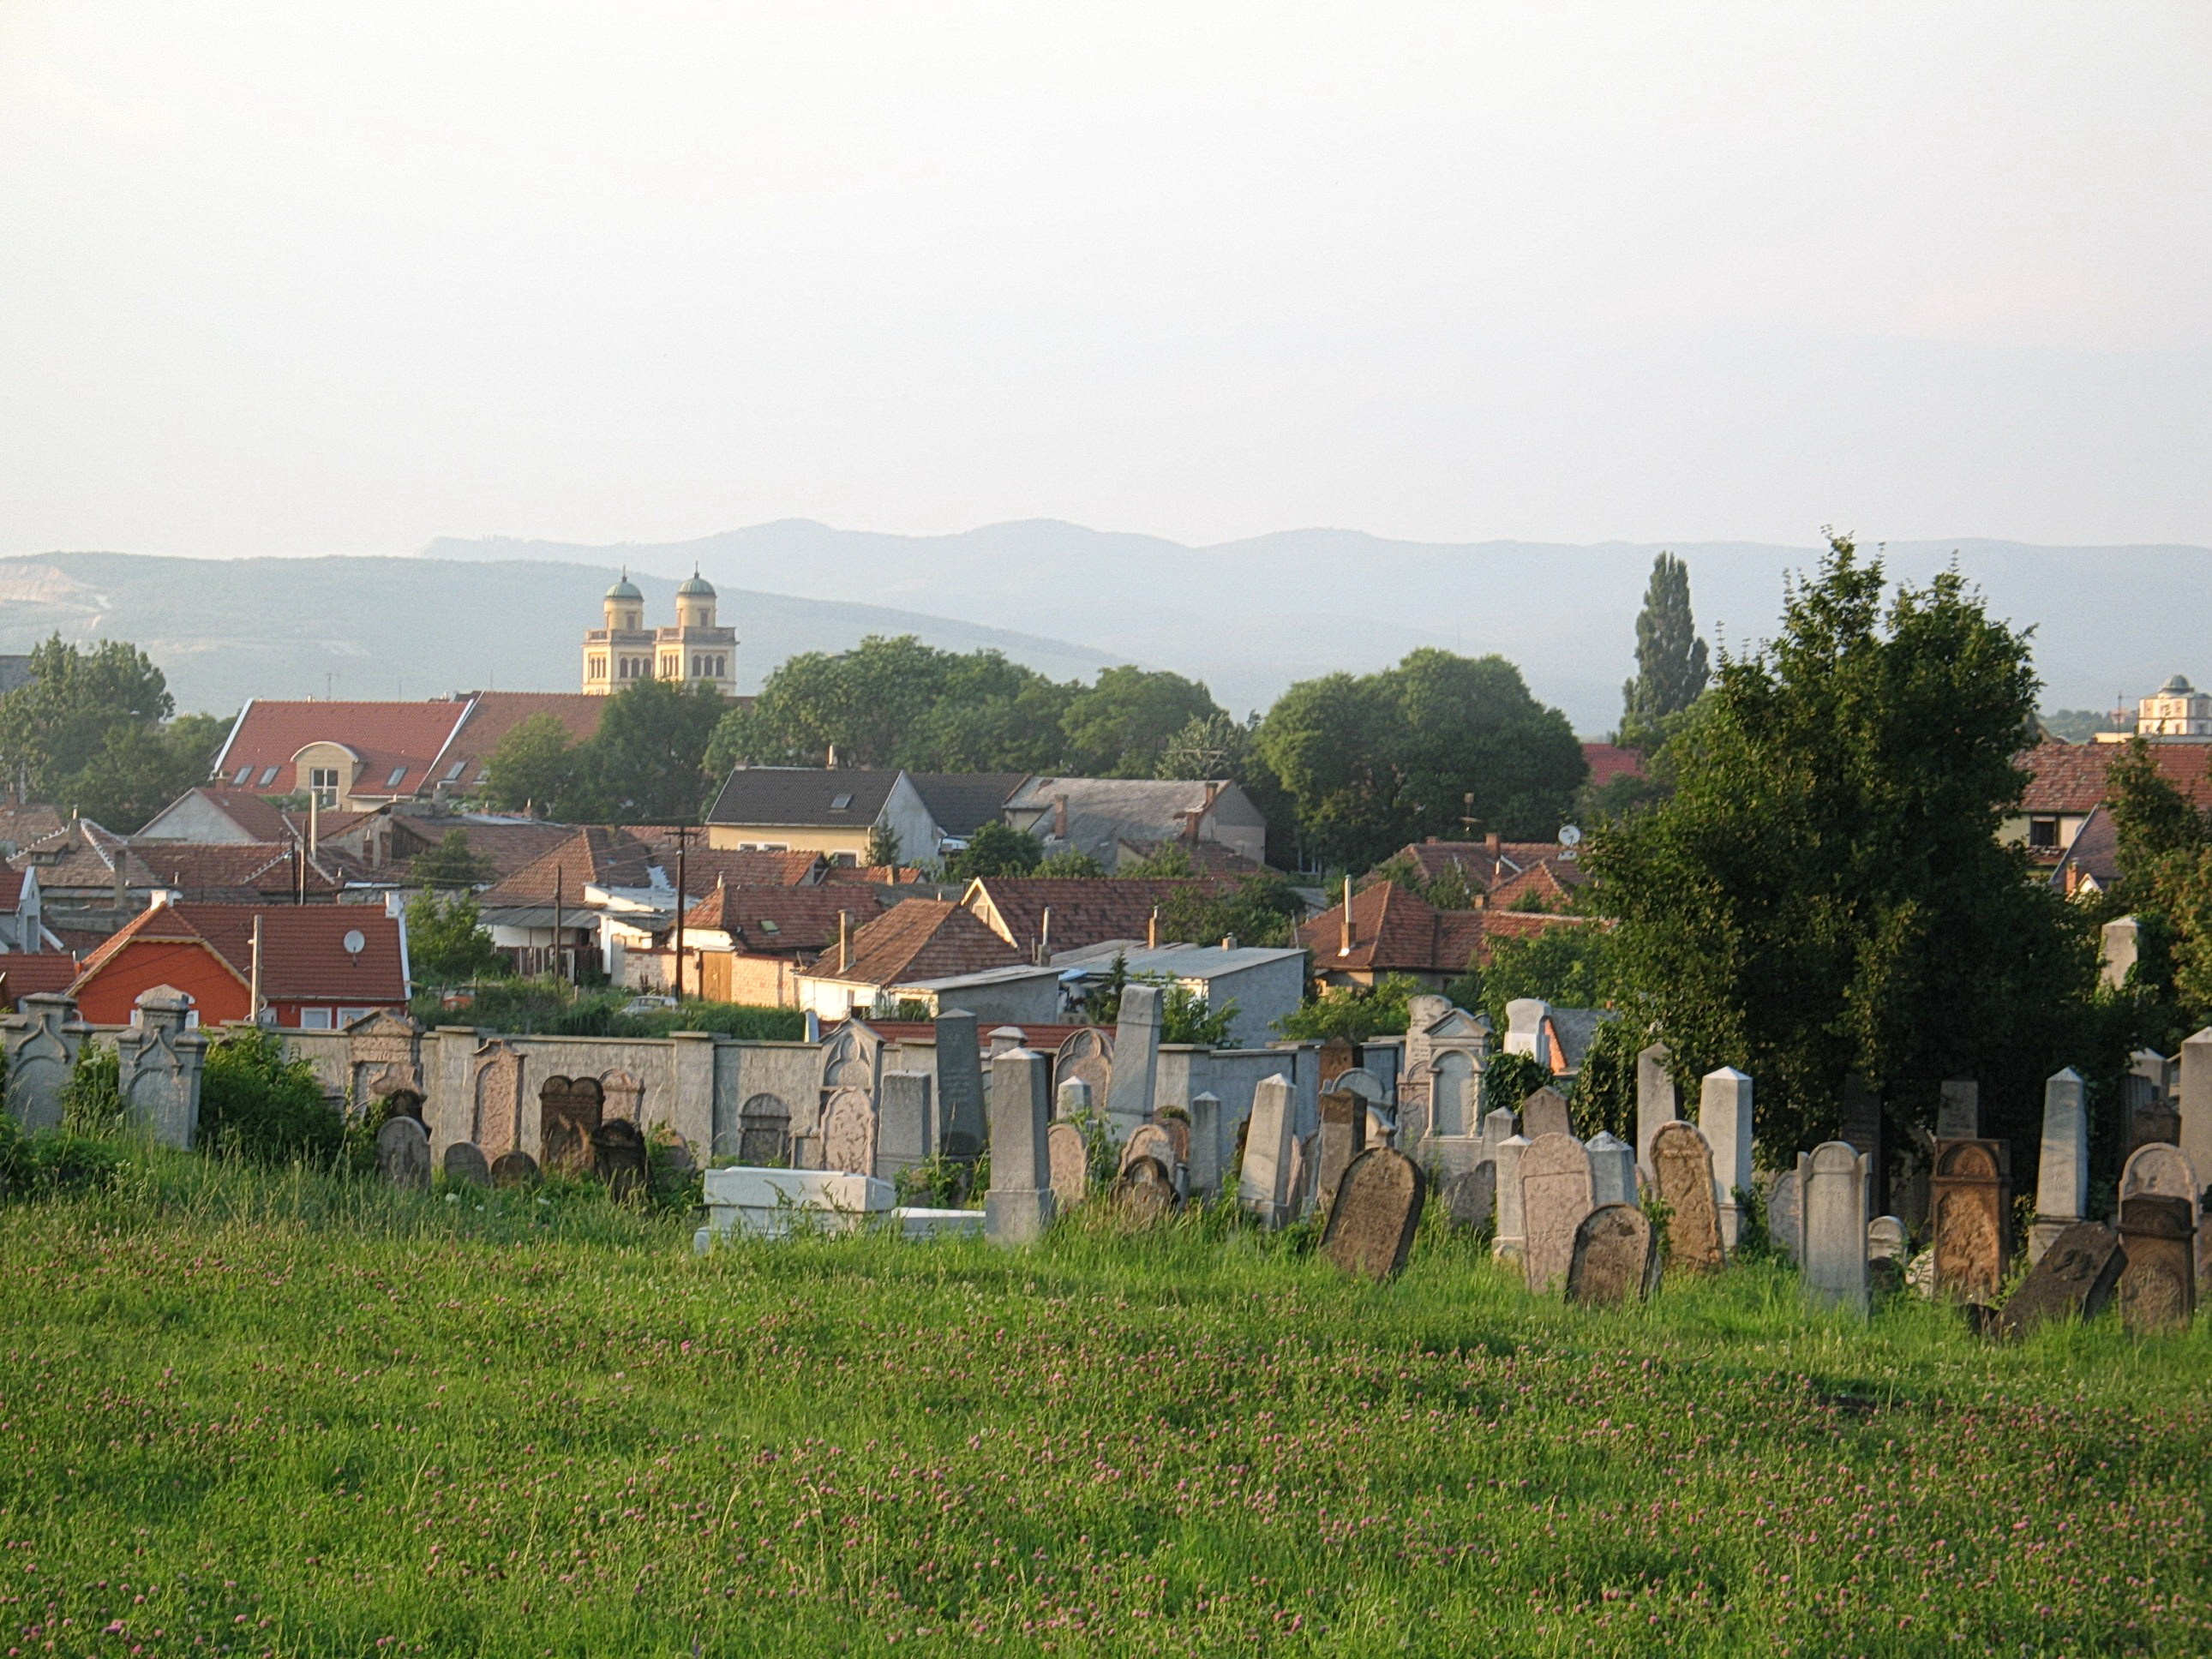 http://varhegyi-family.net/Gabor/Hungary/Tombstones_Eger/Eger_Jewish_cemetery_3.jpg